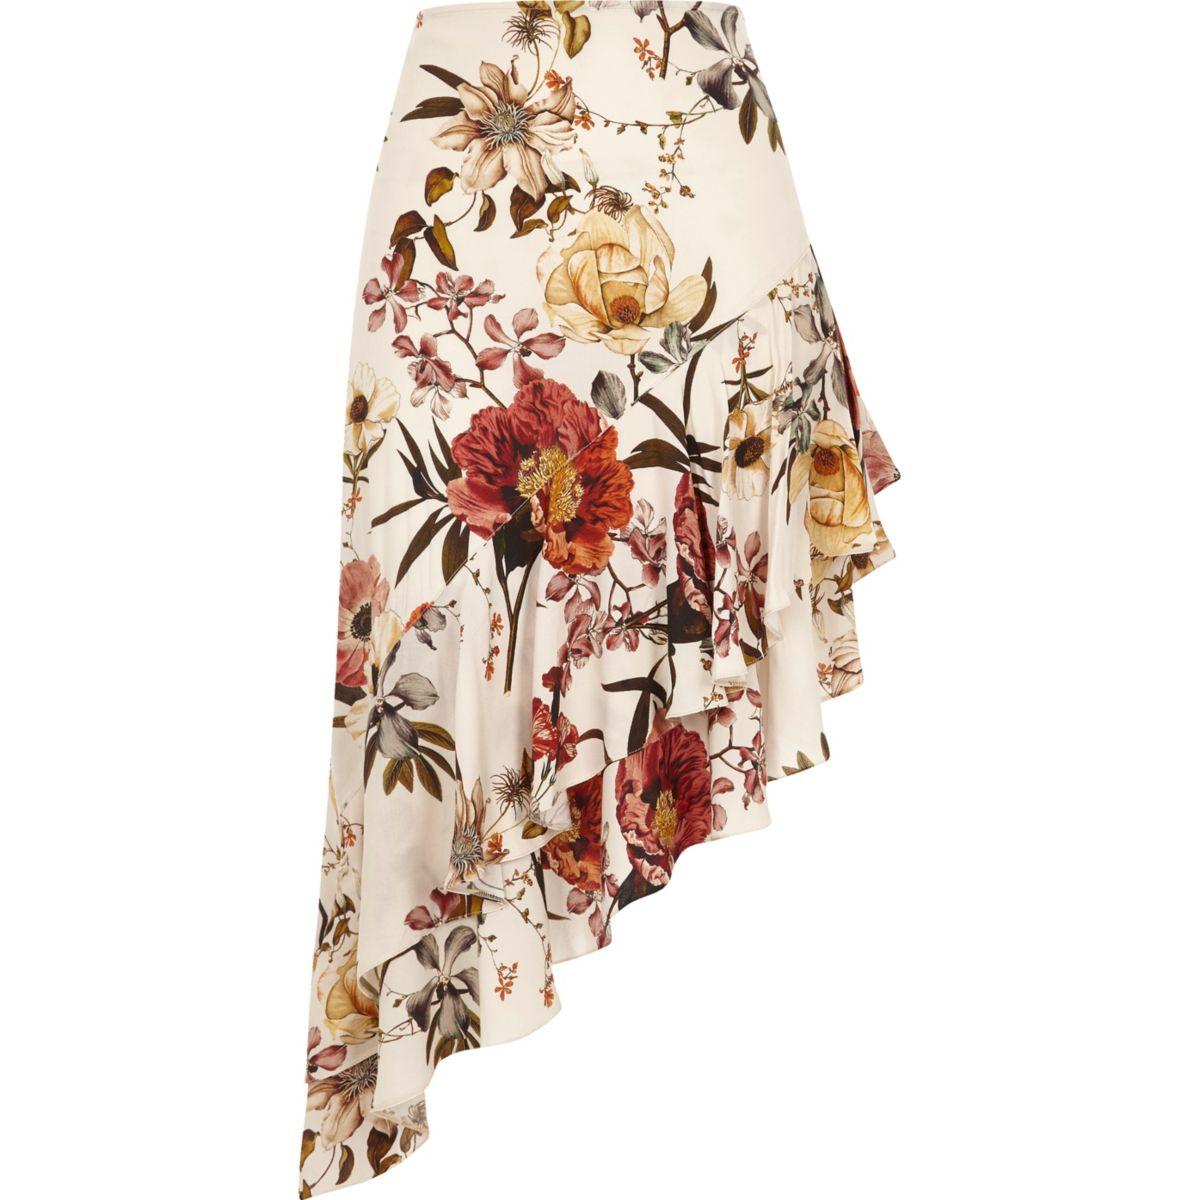 Cream floral print asymmetric frill hem skirt